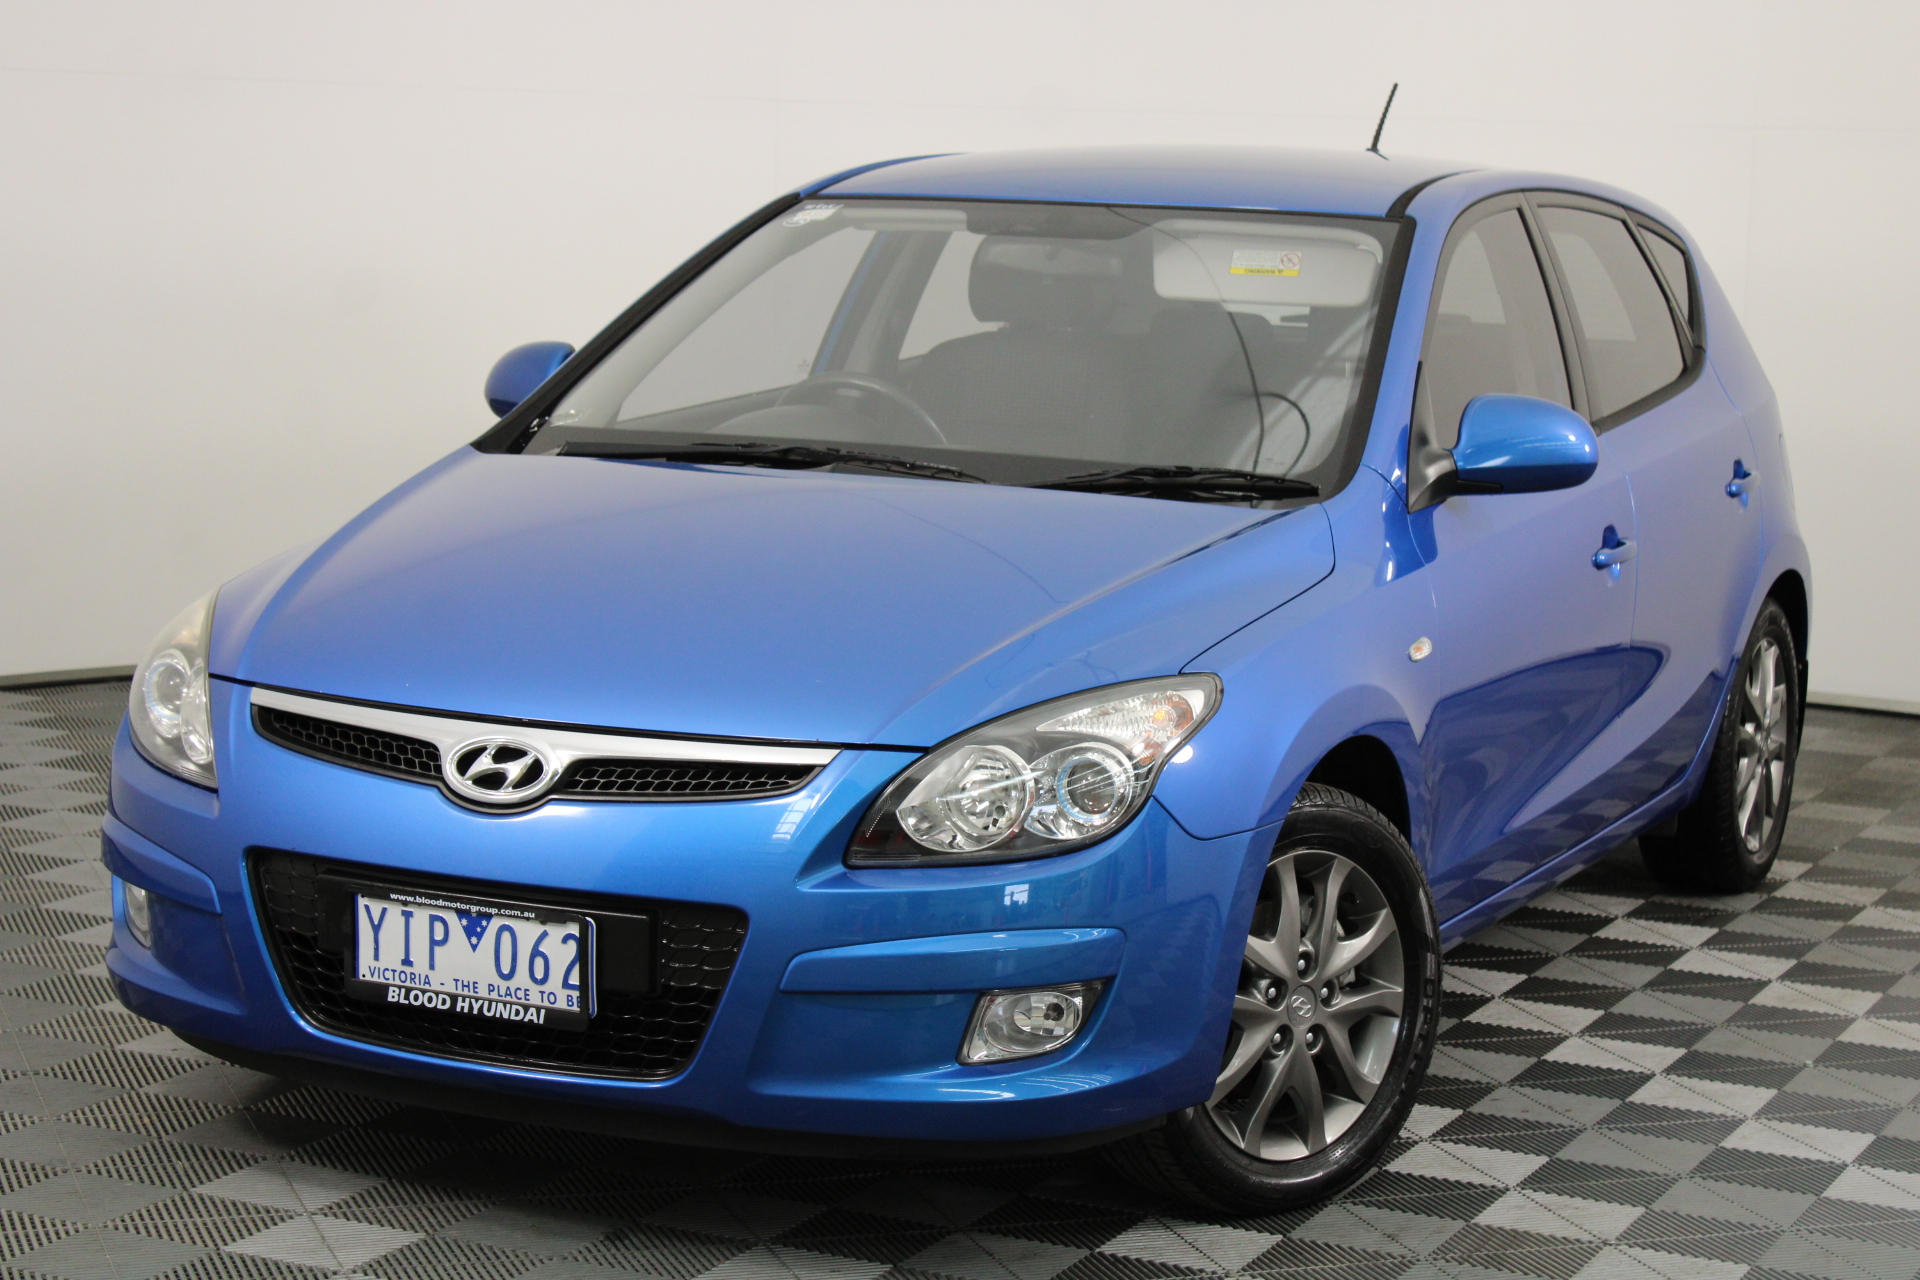 2011 Hyundai i30 SLX FD Manual Hatchback